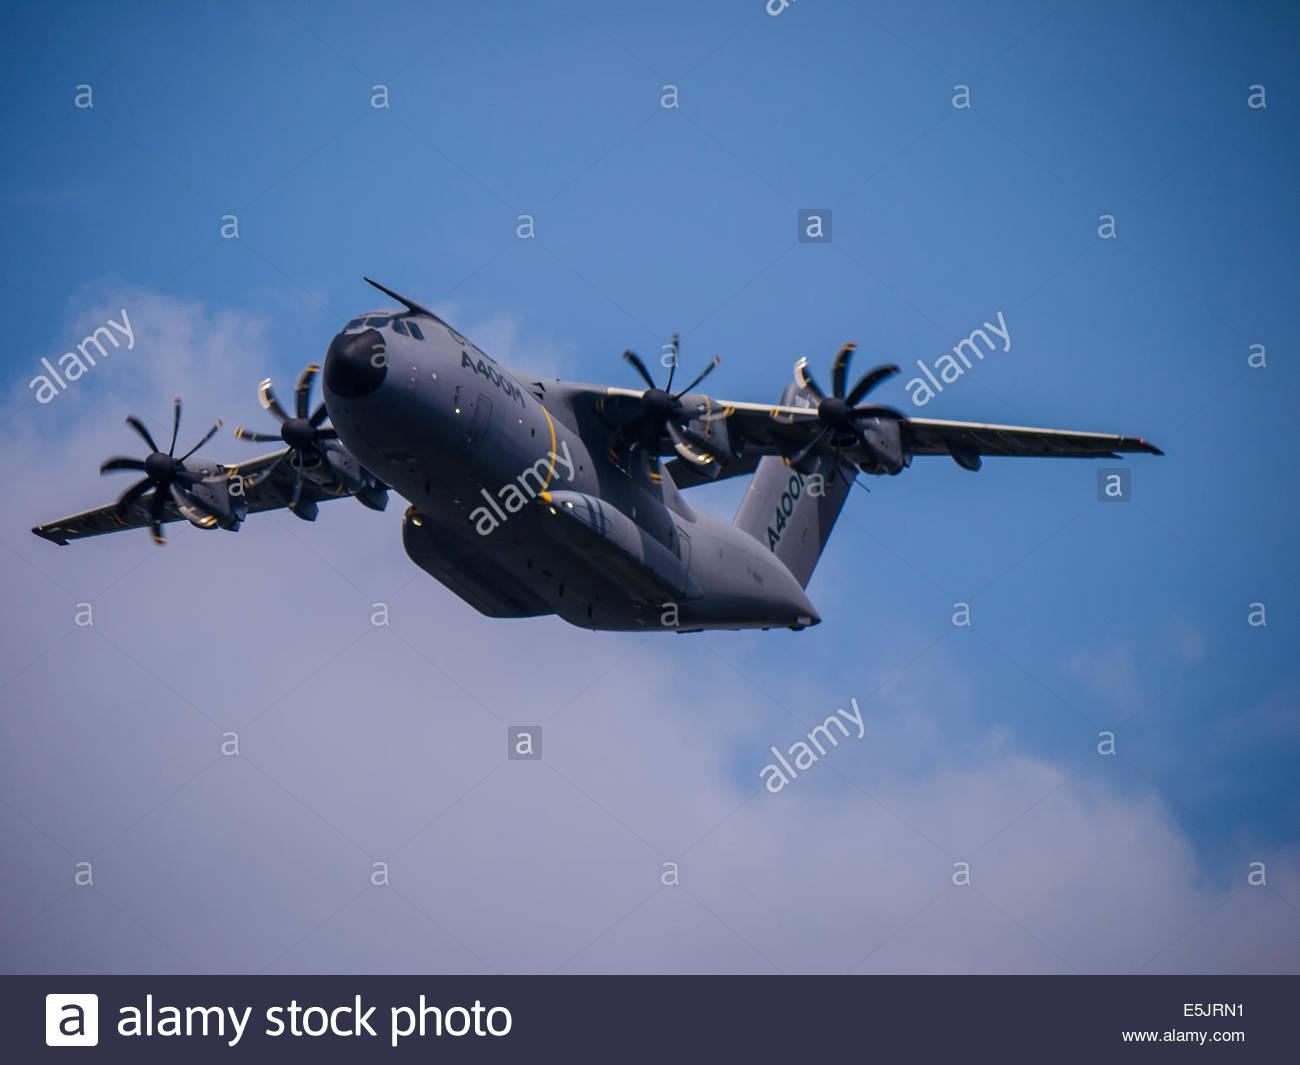 Farnborough Airshow 2014 Airbus A400M Military Transport - Stock Image